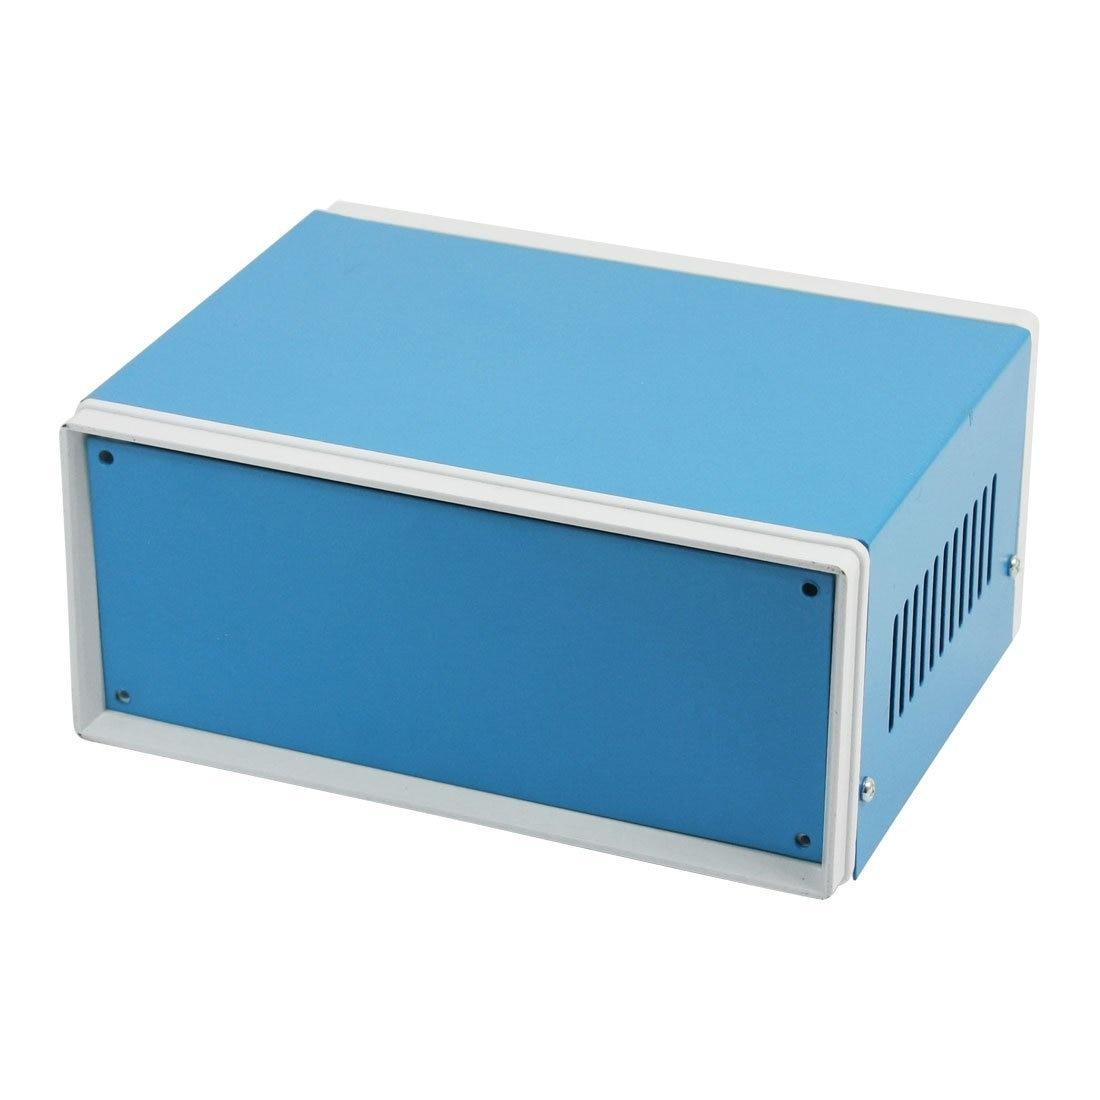 6.7 x 5.1 x 3.1 Blue Metal Enclosure Project Case DIY Junction Box 9 8 x 7 5 x 4 3 blue metal enclosure project case diy junction box